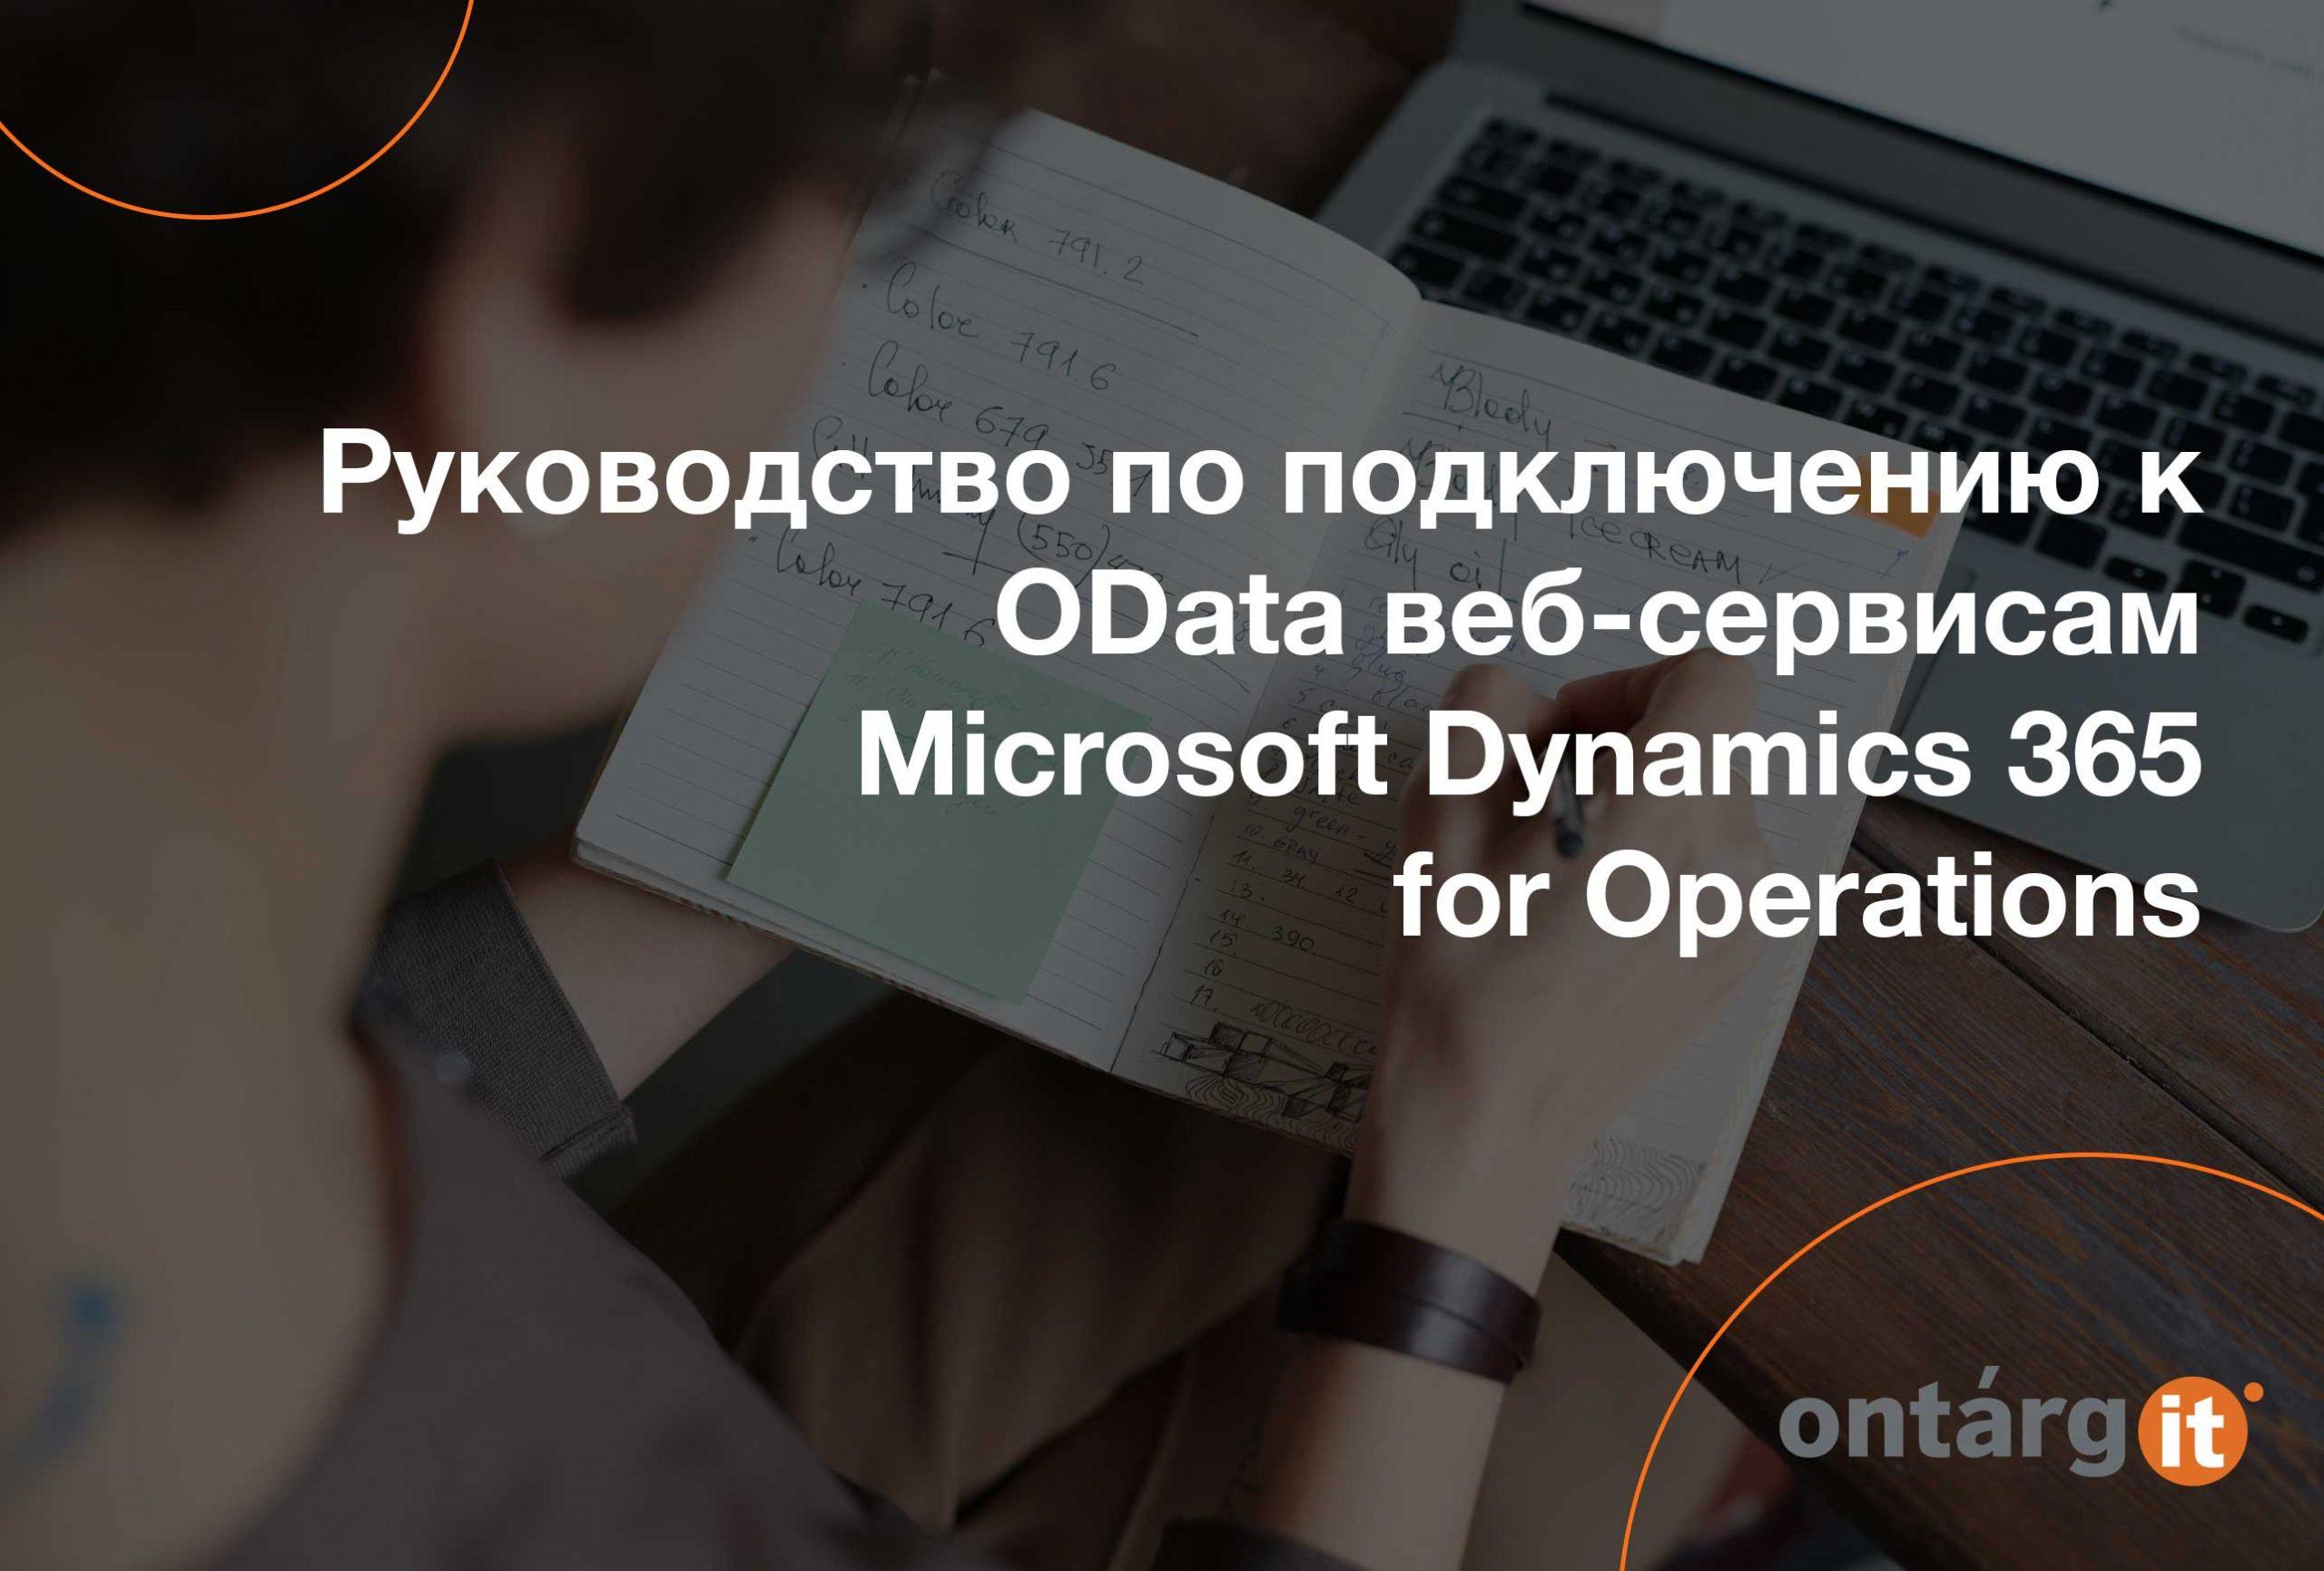 Руководство-по-подключению-к-OData-веб-сервисам-Microsoft-Dynamics-365-for-Operations